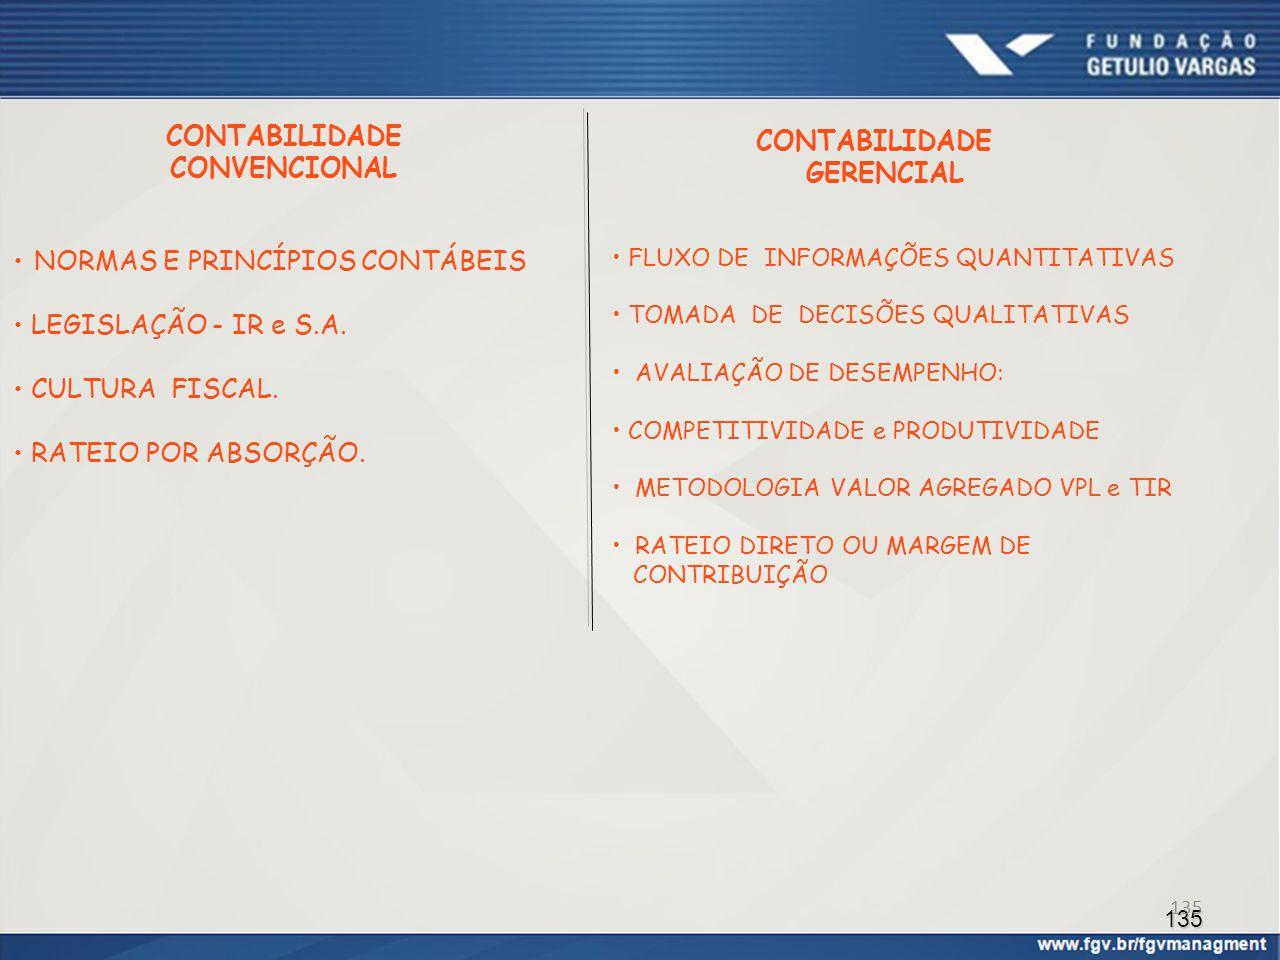 CONTABILIDADE CONVENCIONAL CONTABILIDADE GERENCIAL